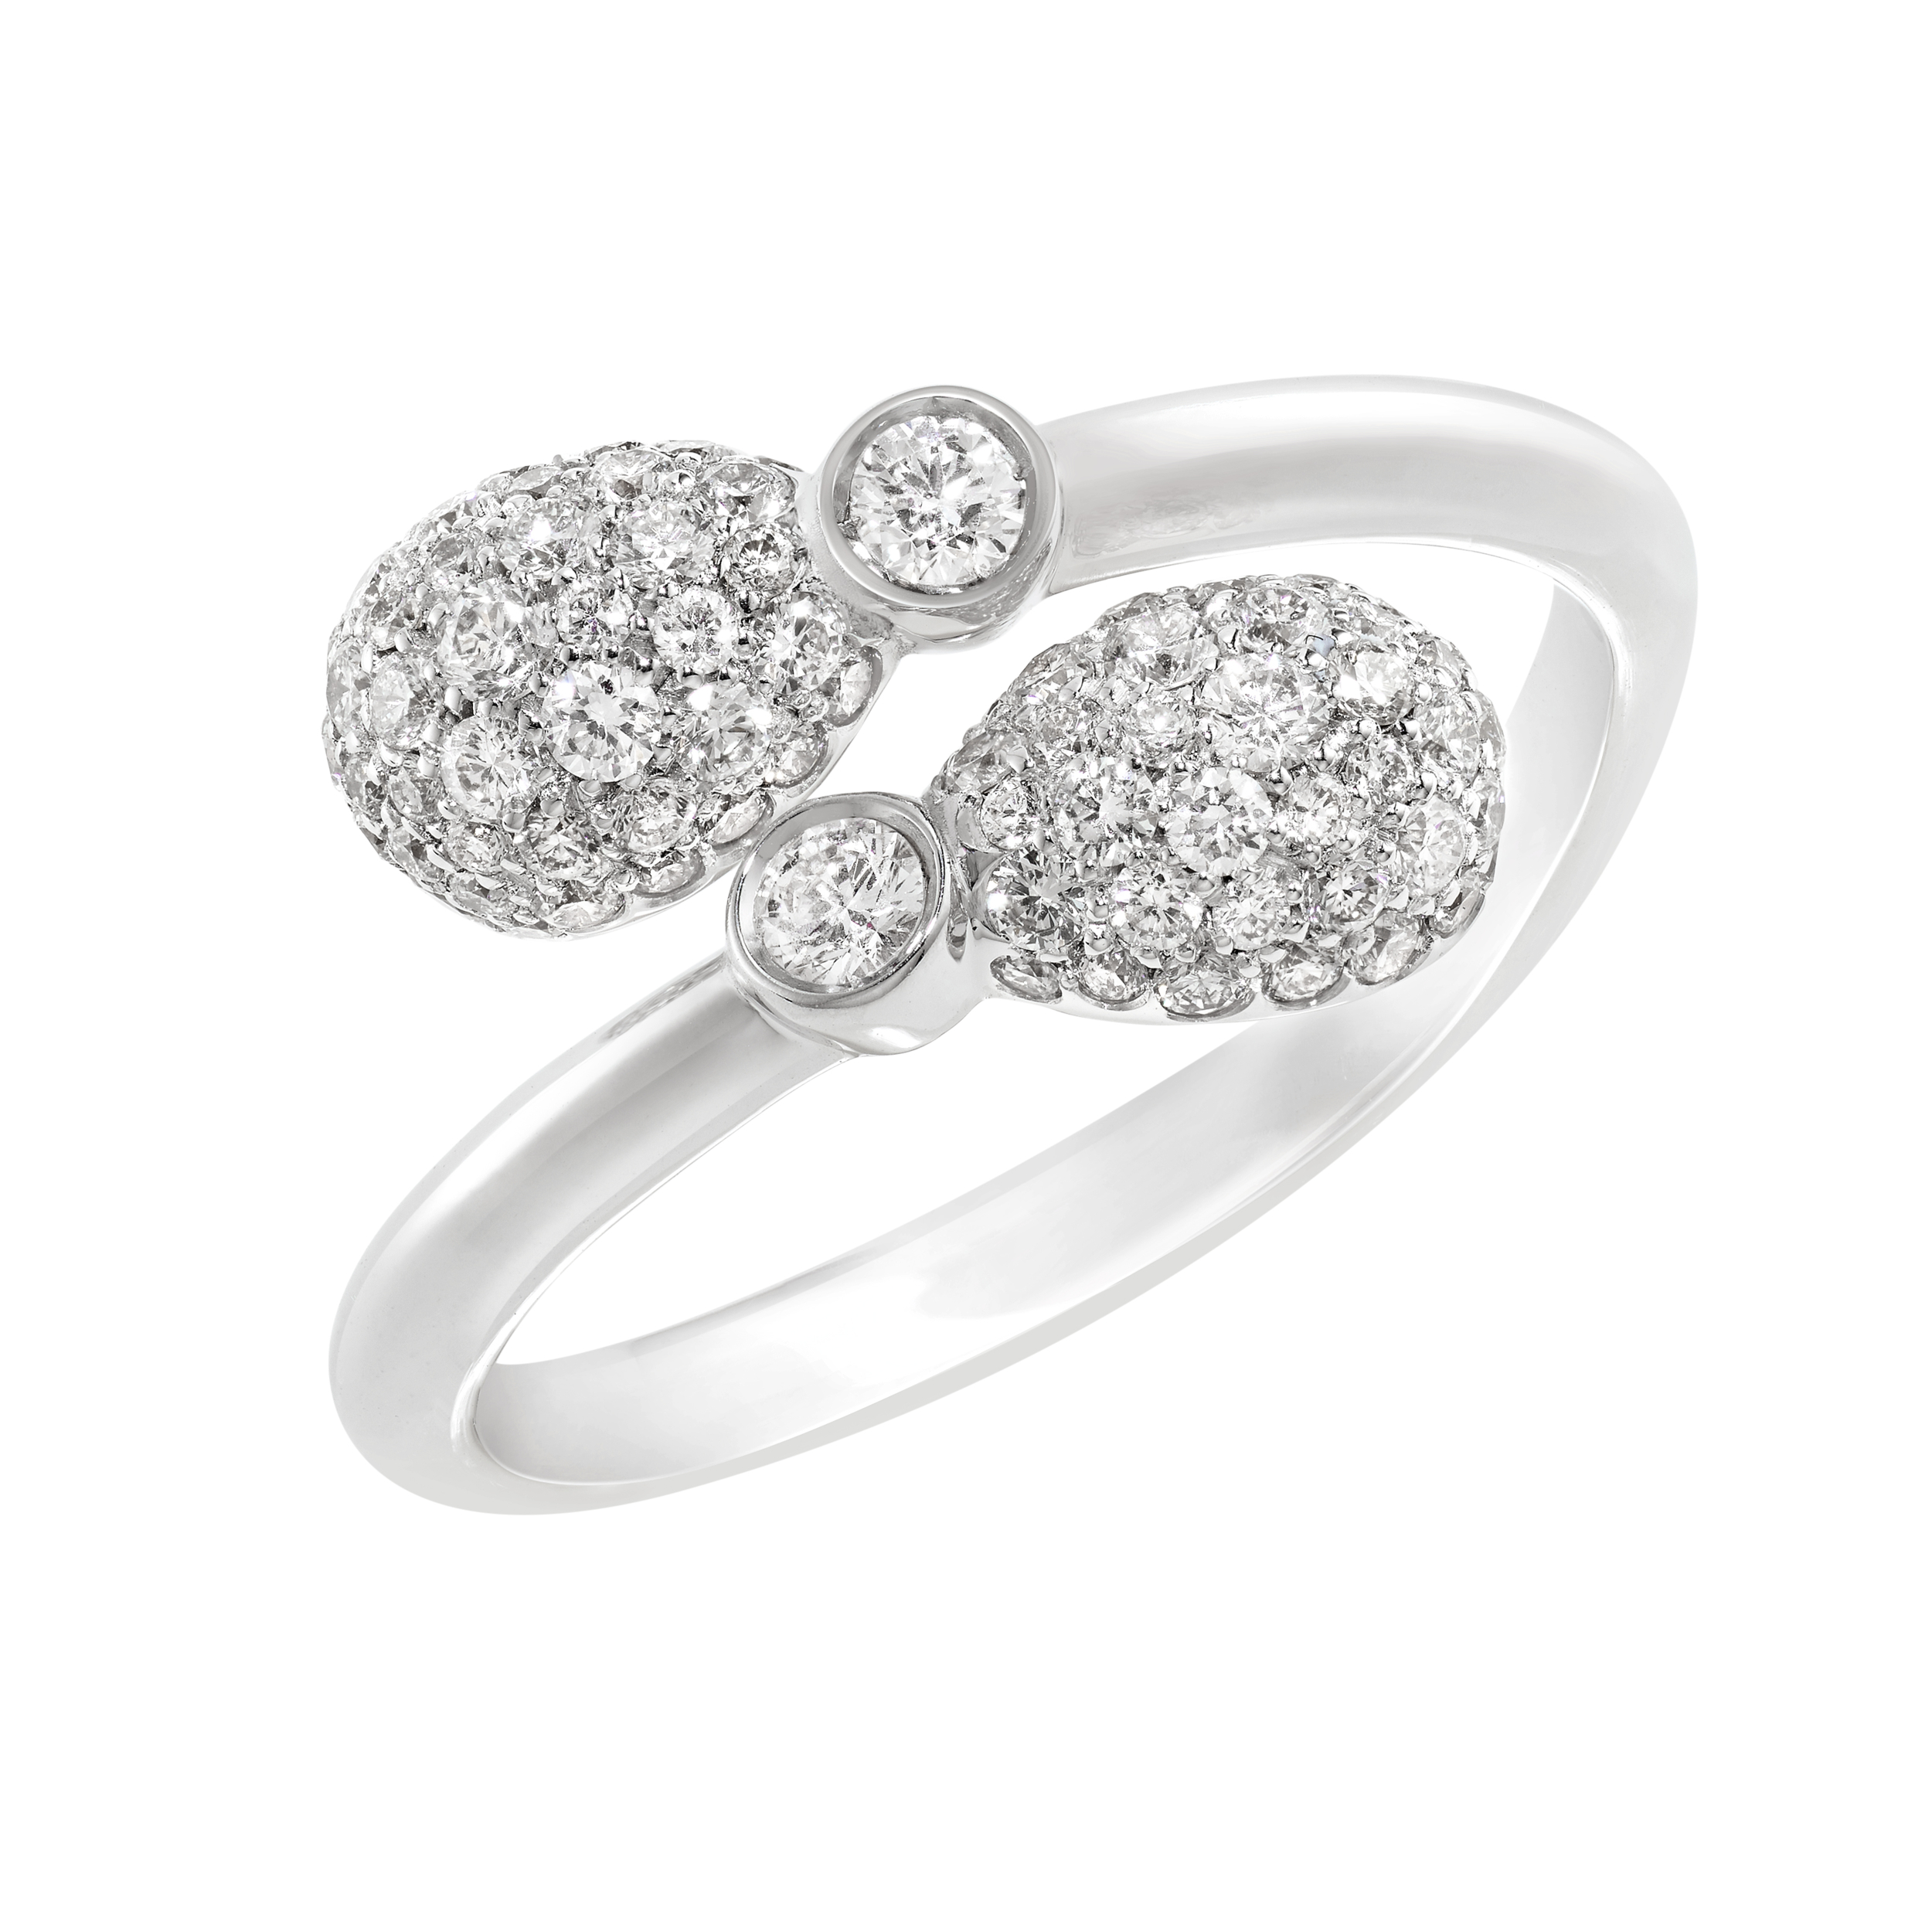 FABERGÉ EMOTION WHITE DIAMOND CROSSOVER RING